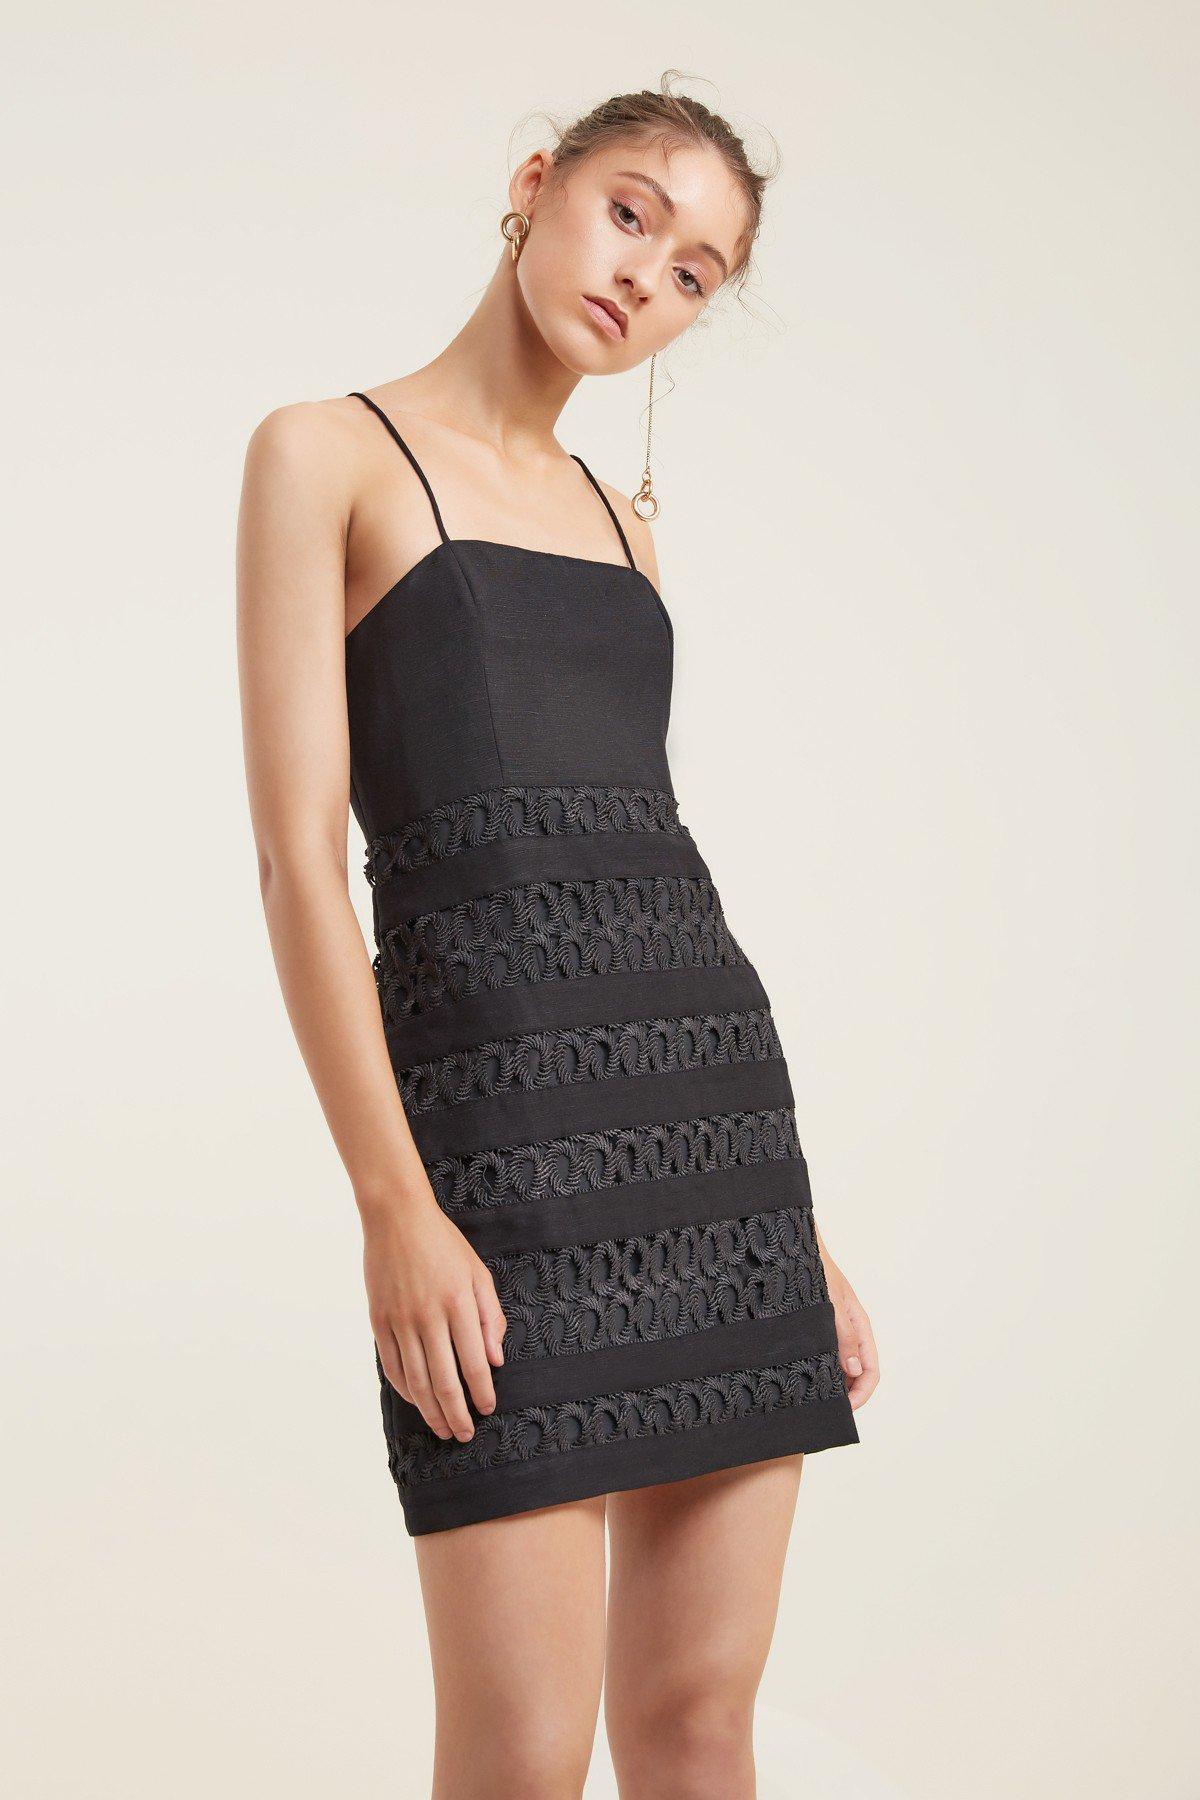 Shop C/MEO Aura Mini Dress.